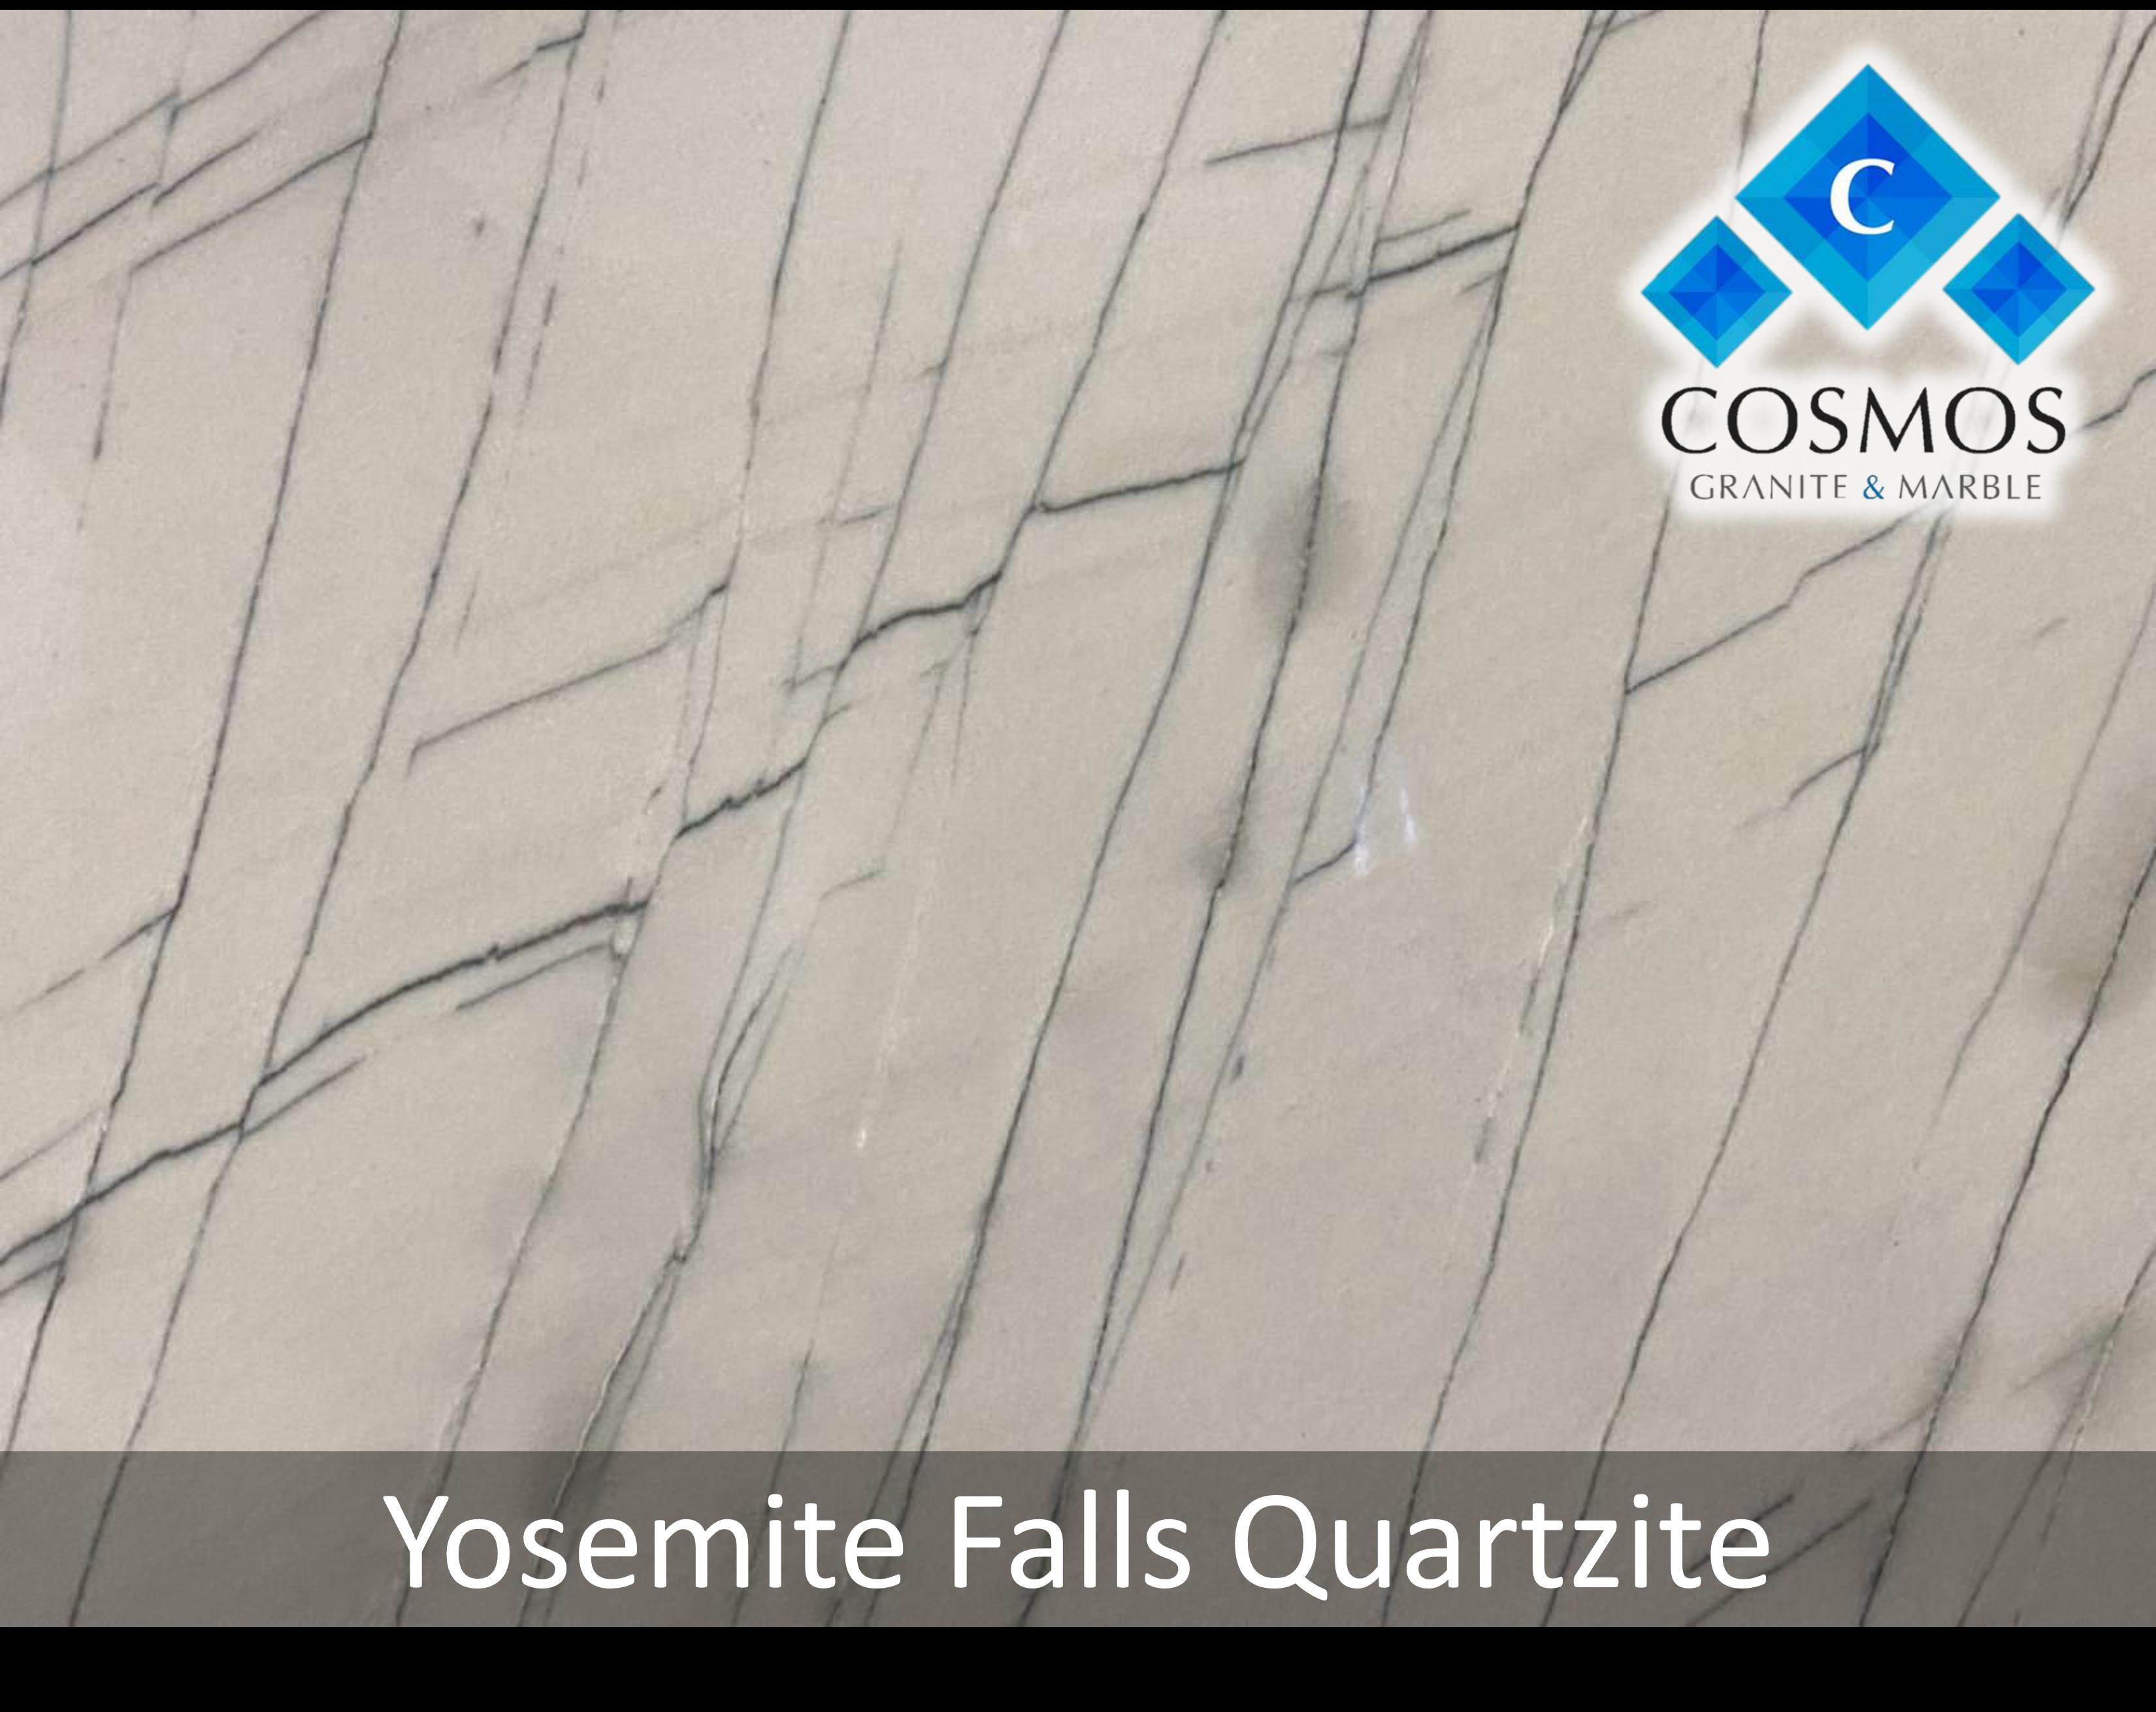 Yosemite Falls Quartzite 3CM - Washington, DC